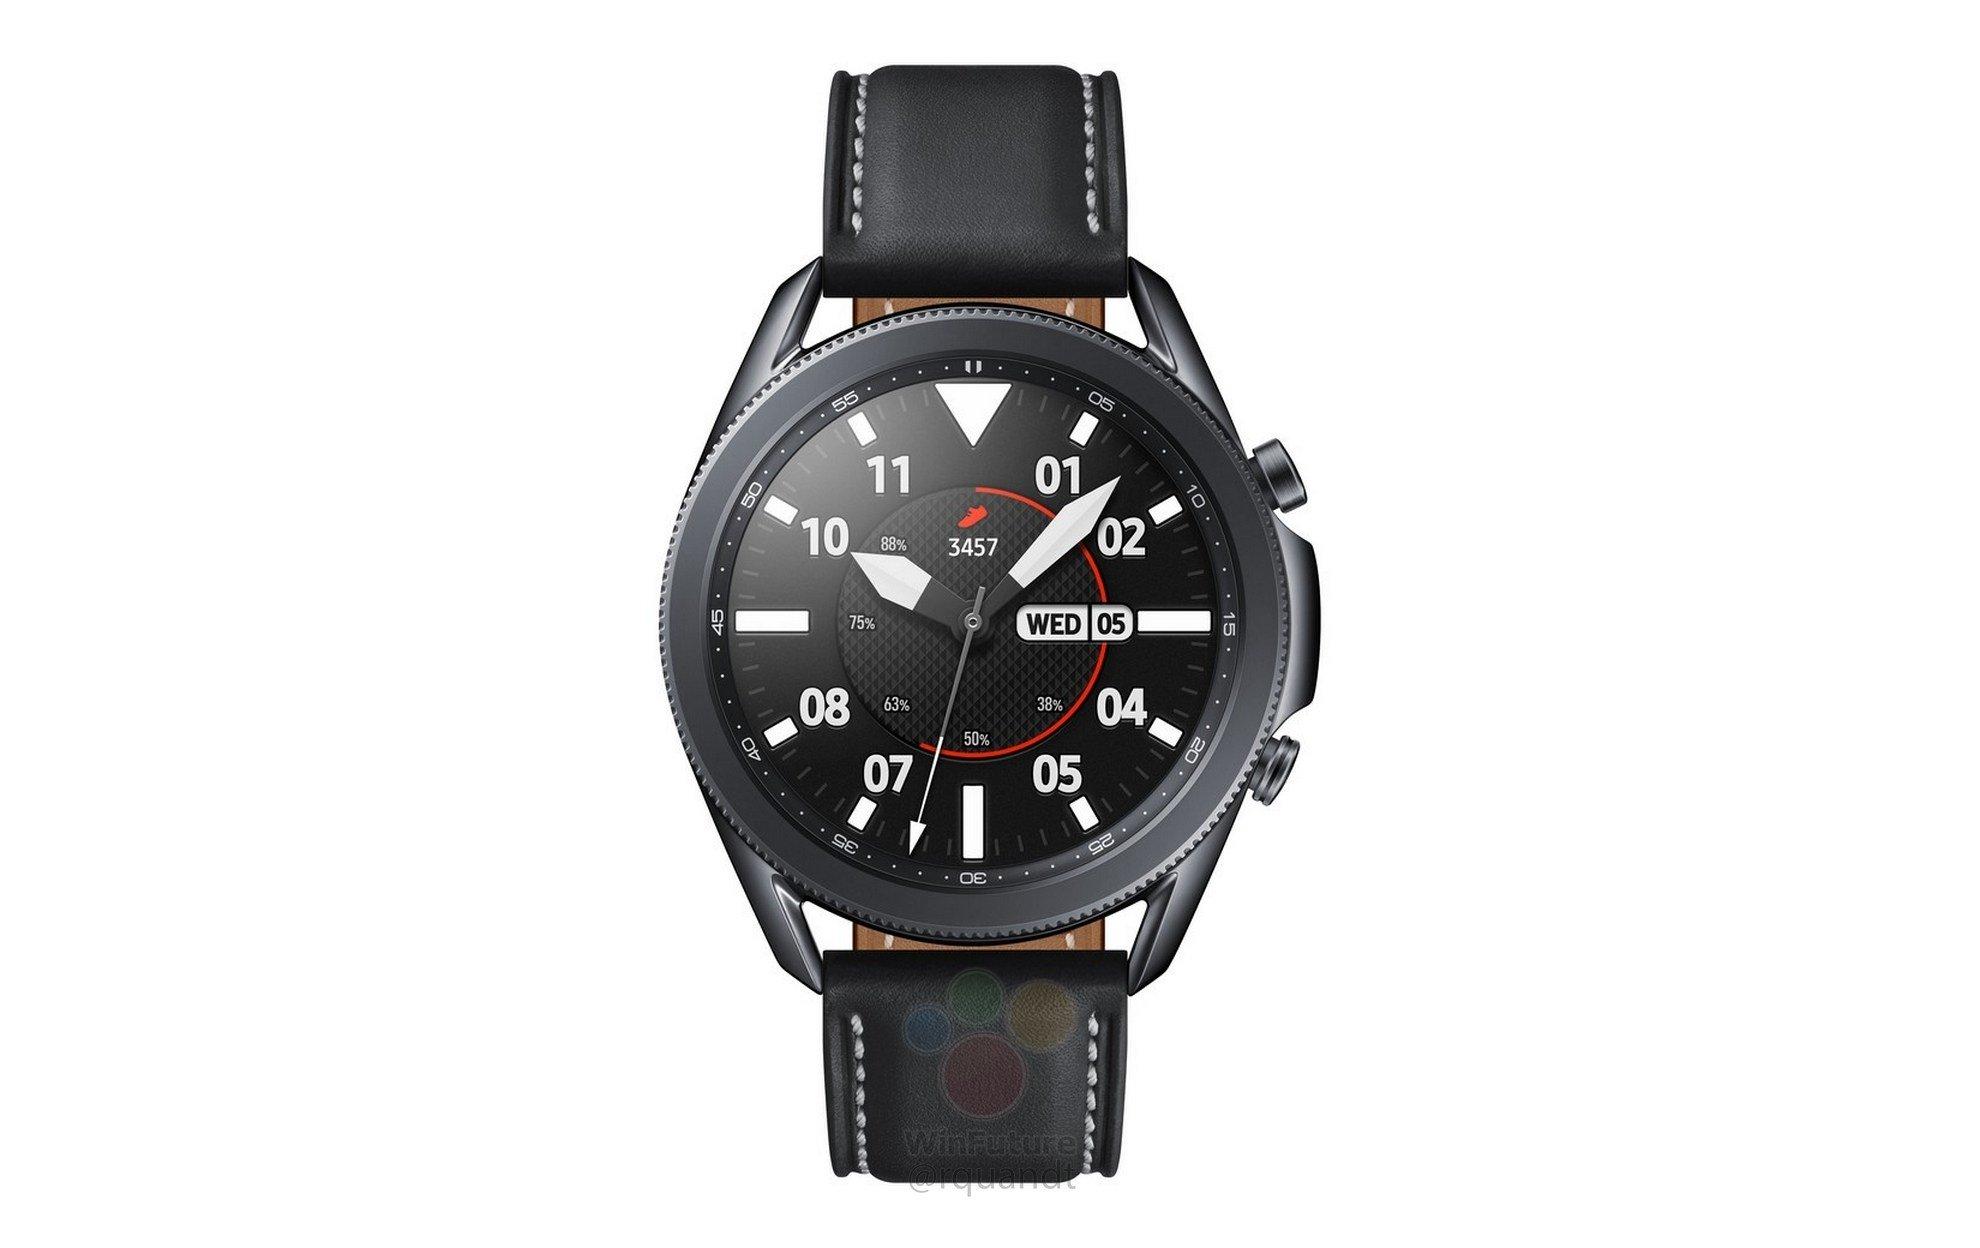 Samsung-Galaxy-Watch-3-45mm-1595863818-0-0.jpg